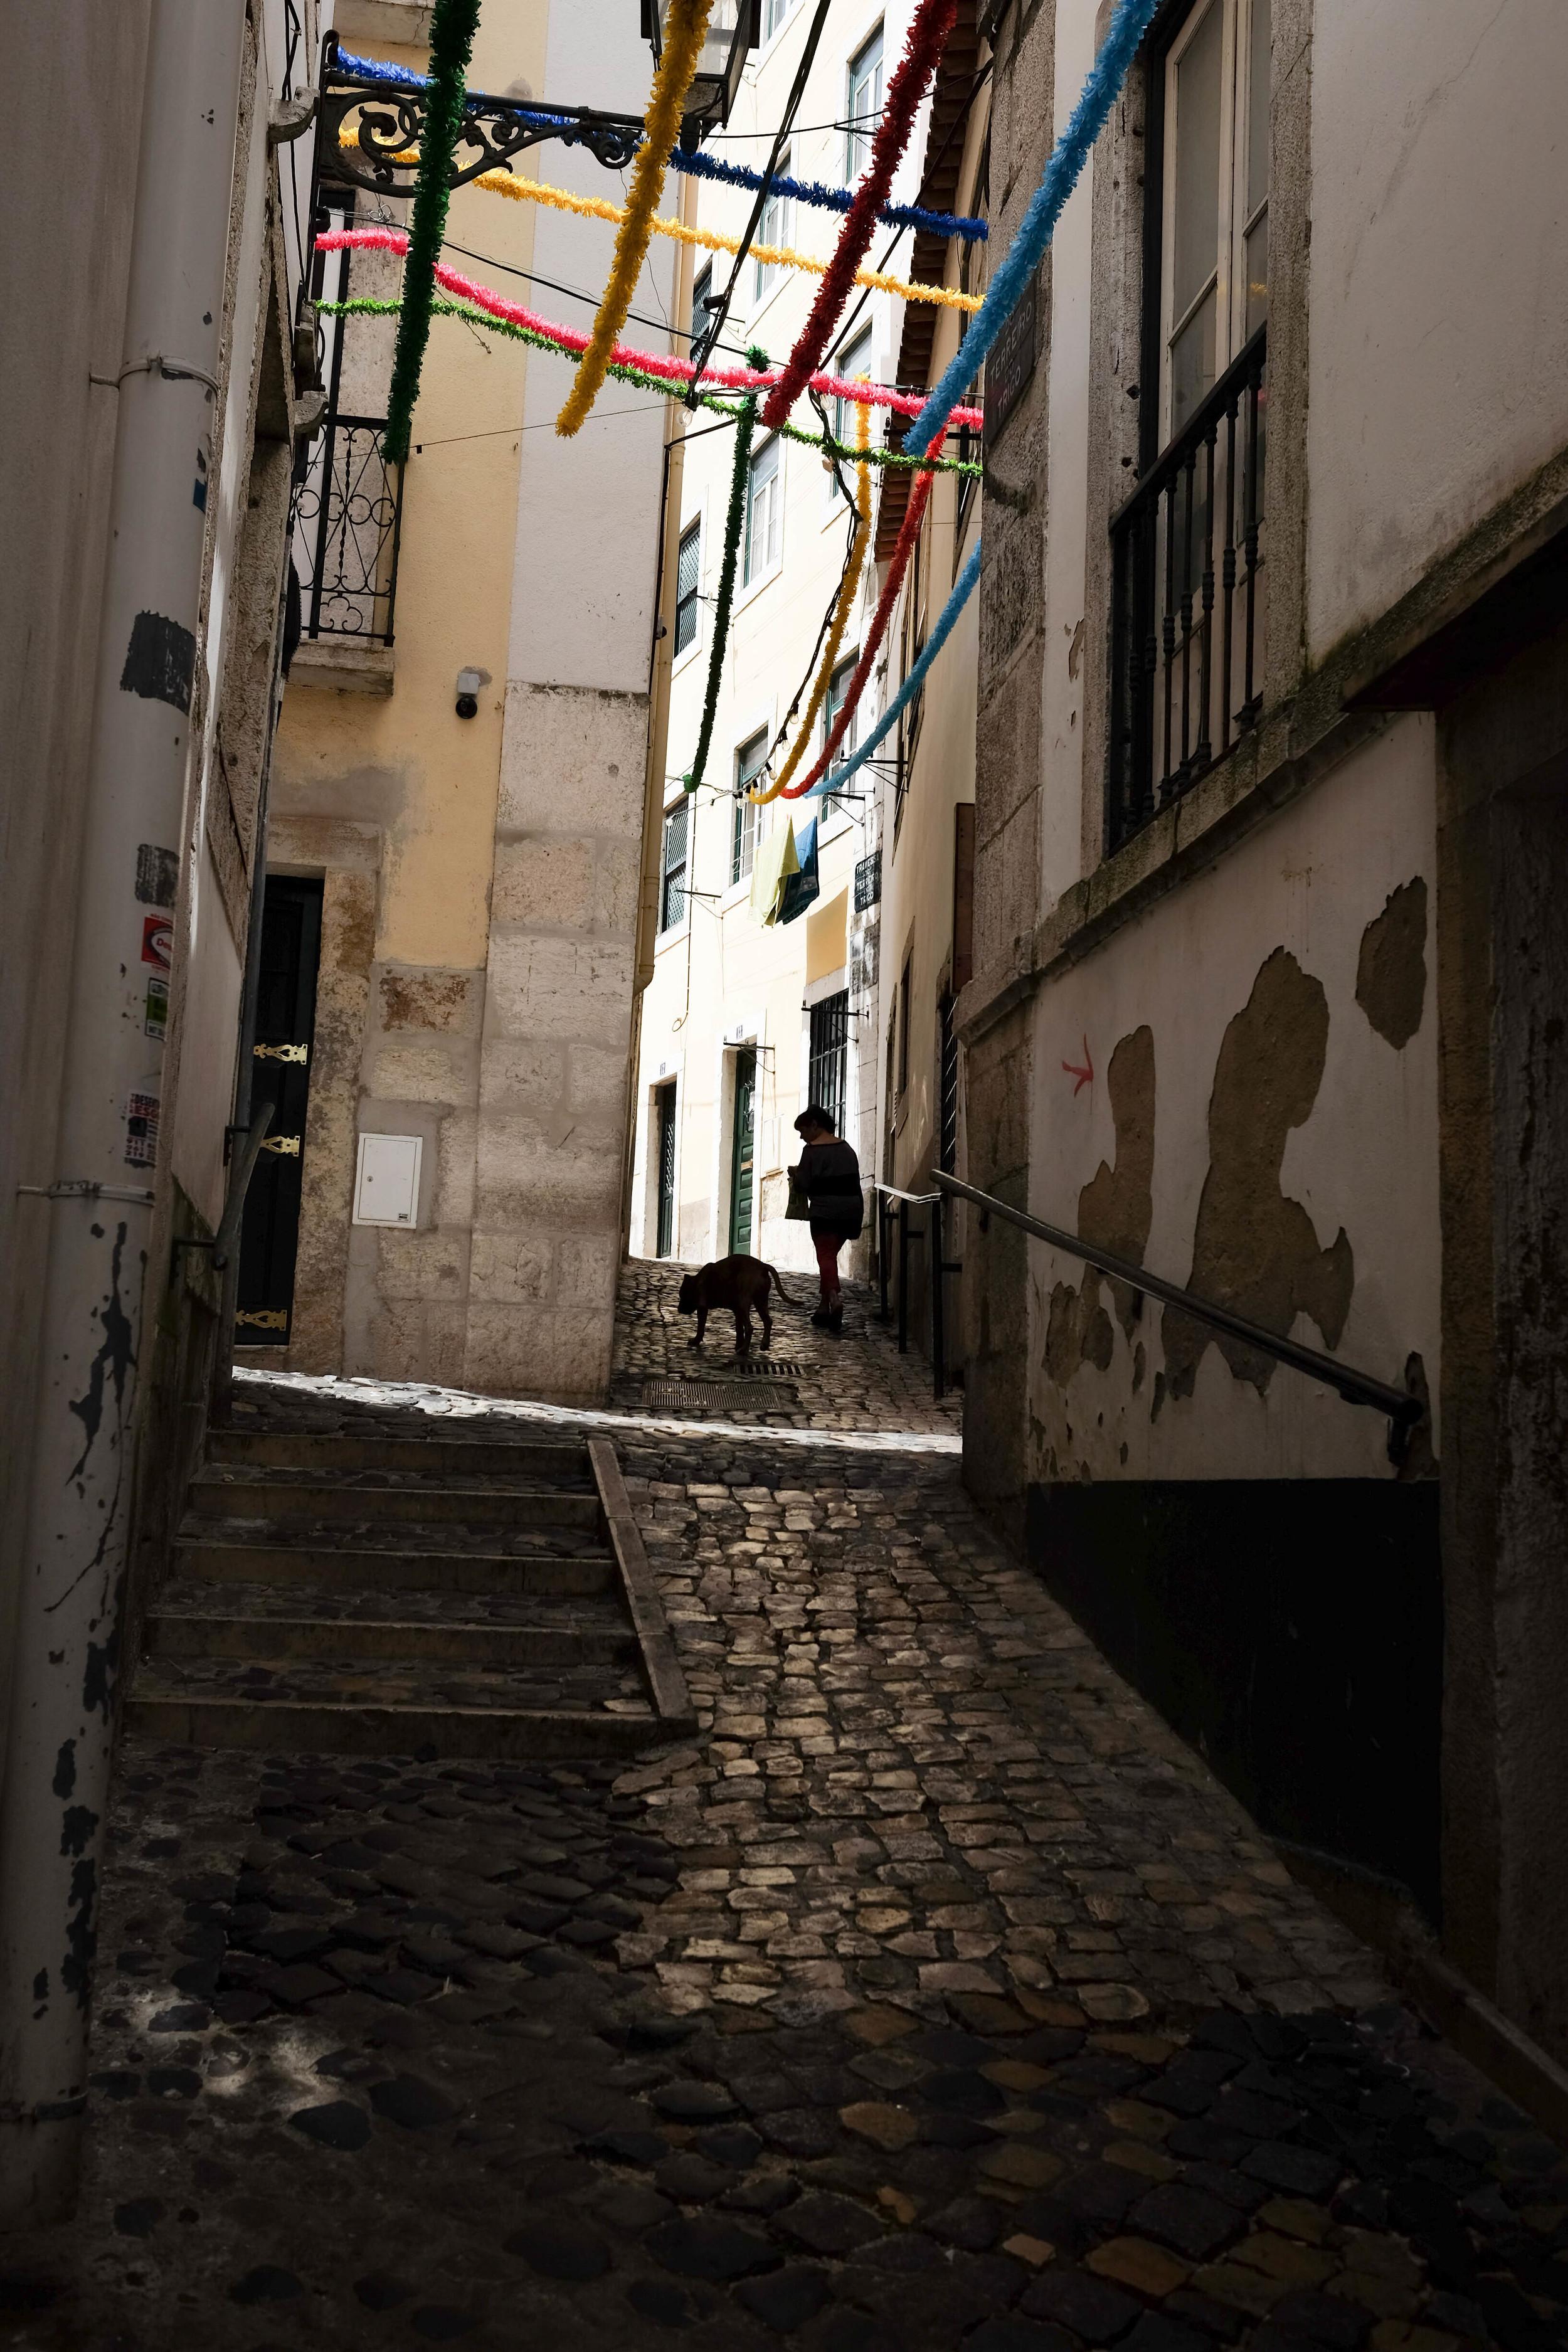 Kristen_Humbert_Philadelpia_Photographer_Travel_Editorial_Portugal-3309.jpg